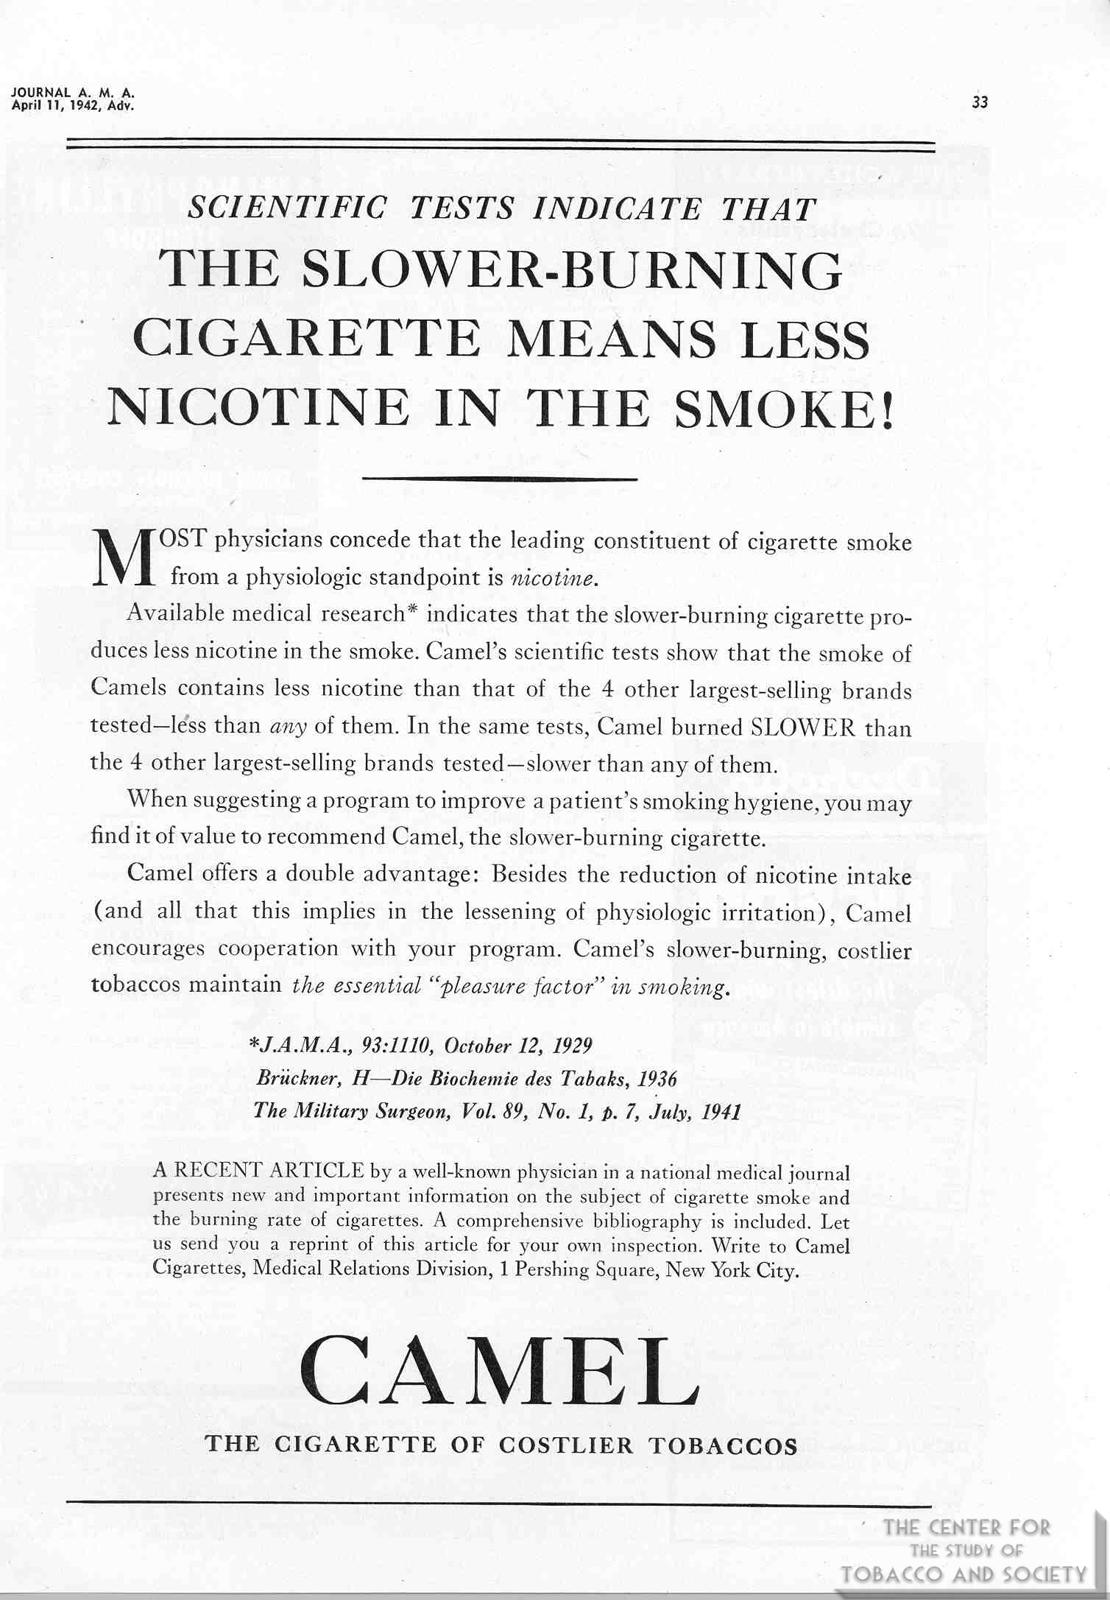 1942 04 11 JAMA Camel Ad